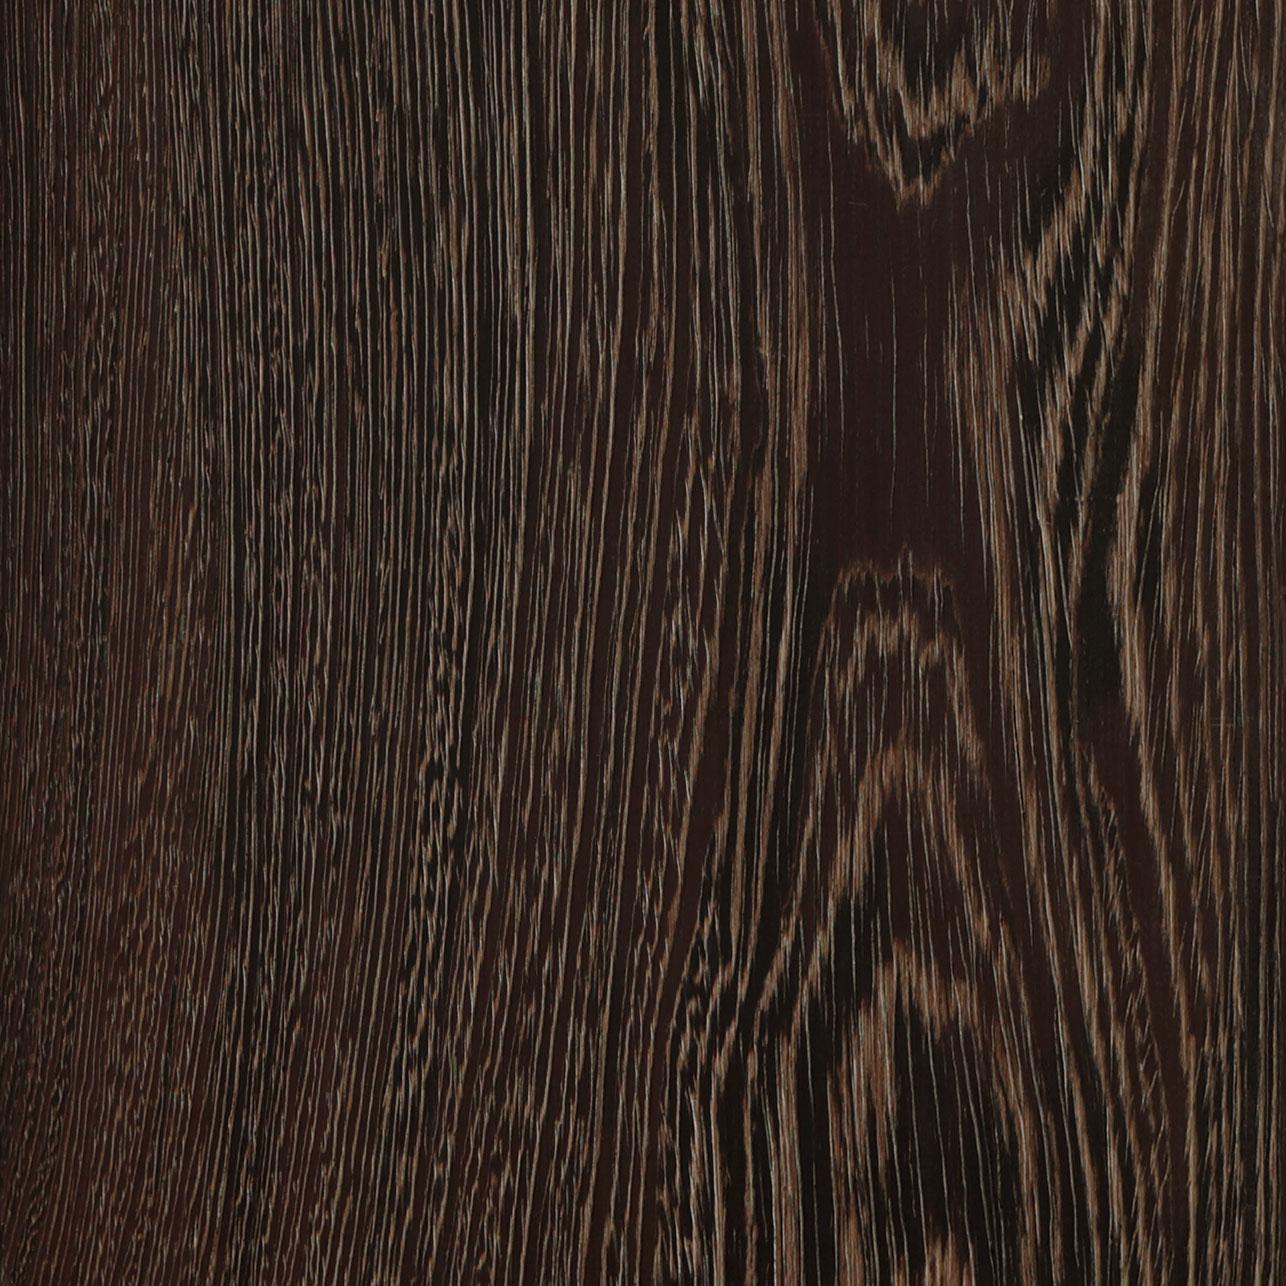 Element7-wide-plank-samples-WengeNatural_2_AJ_883_158